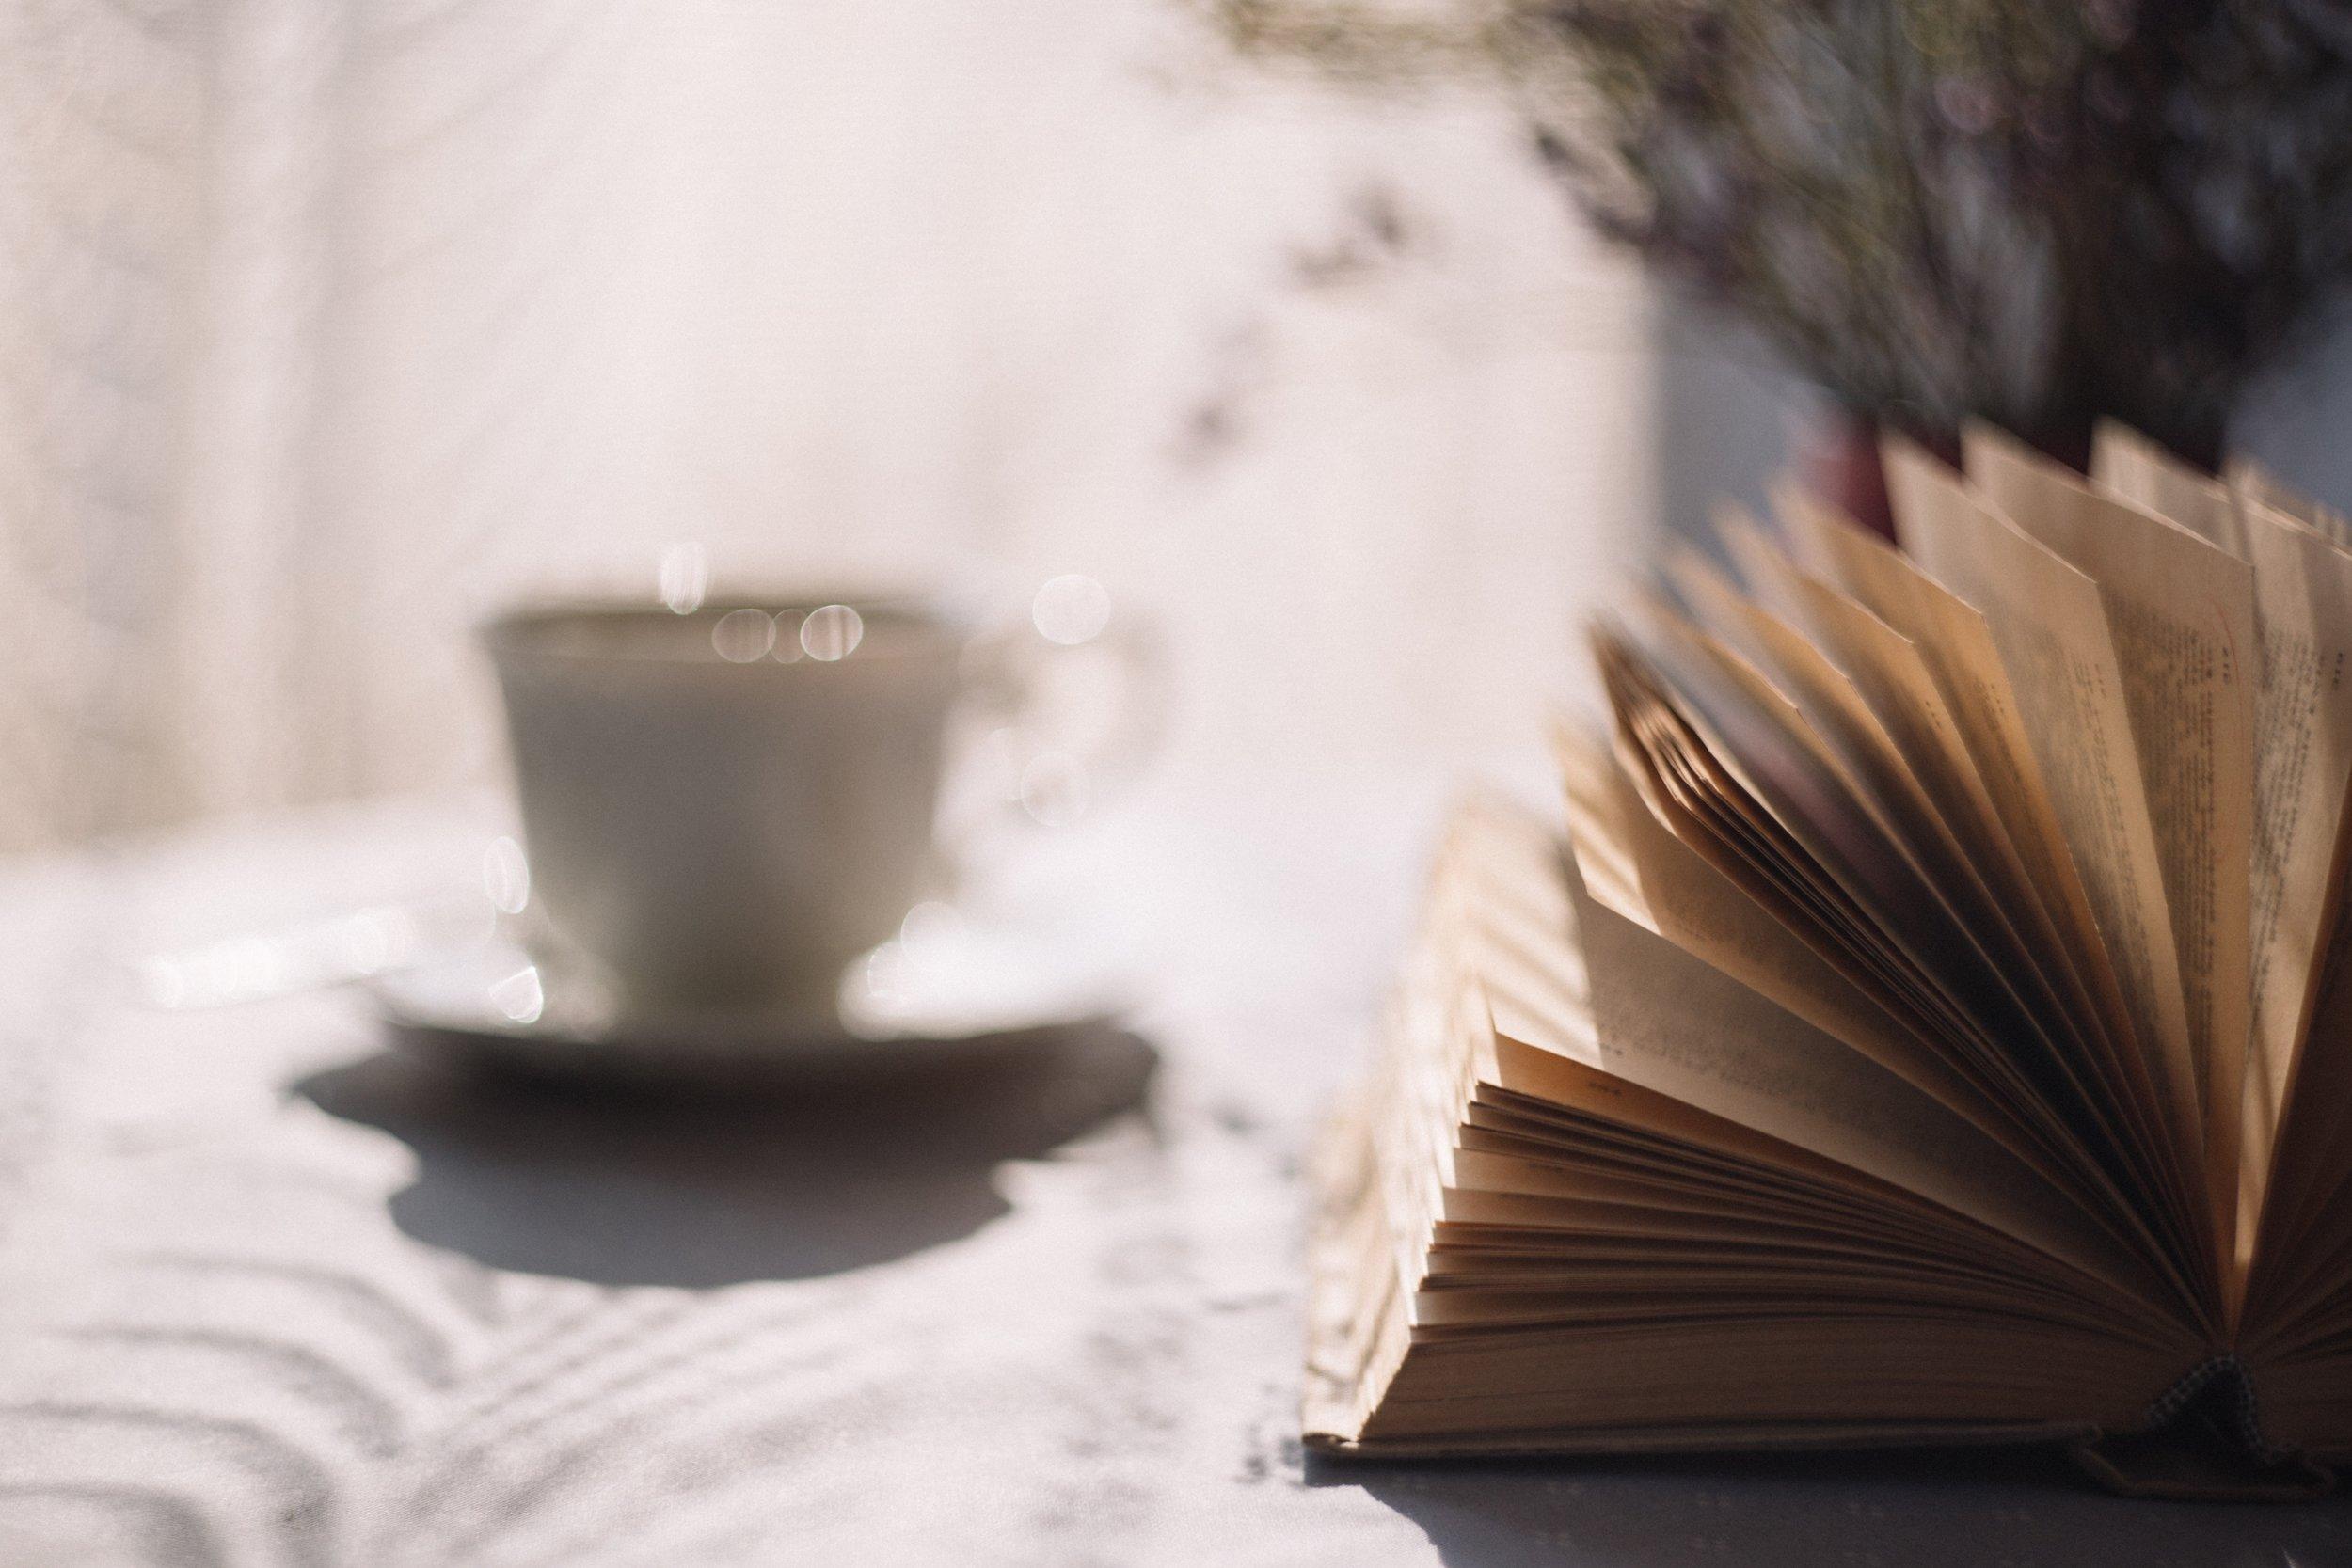 book-coffee-cup-172367.jpg